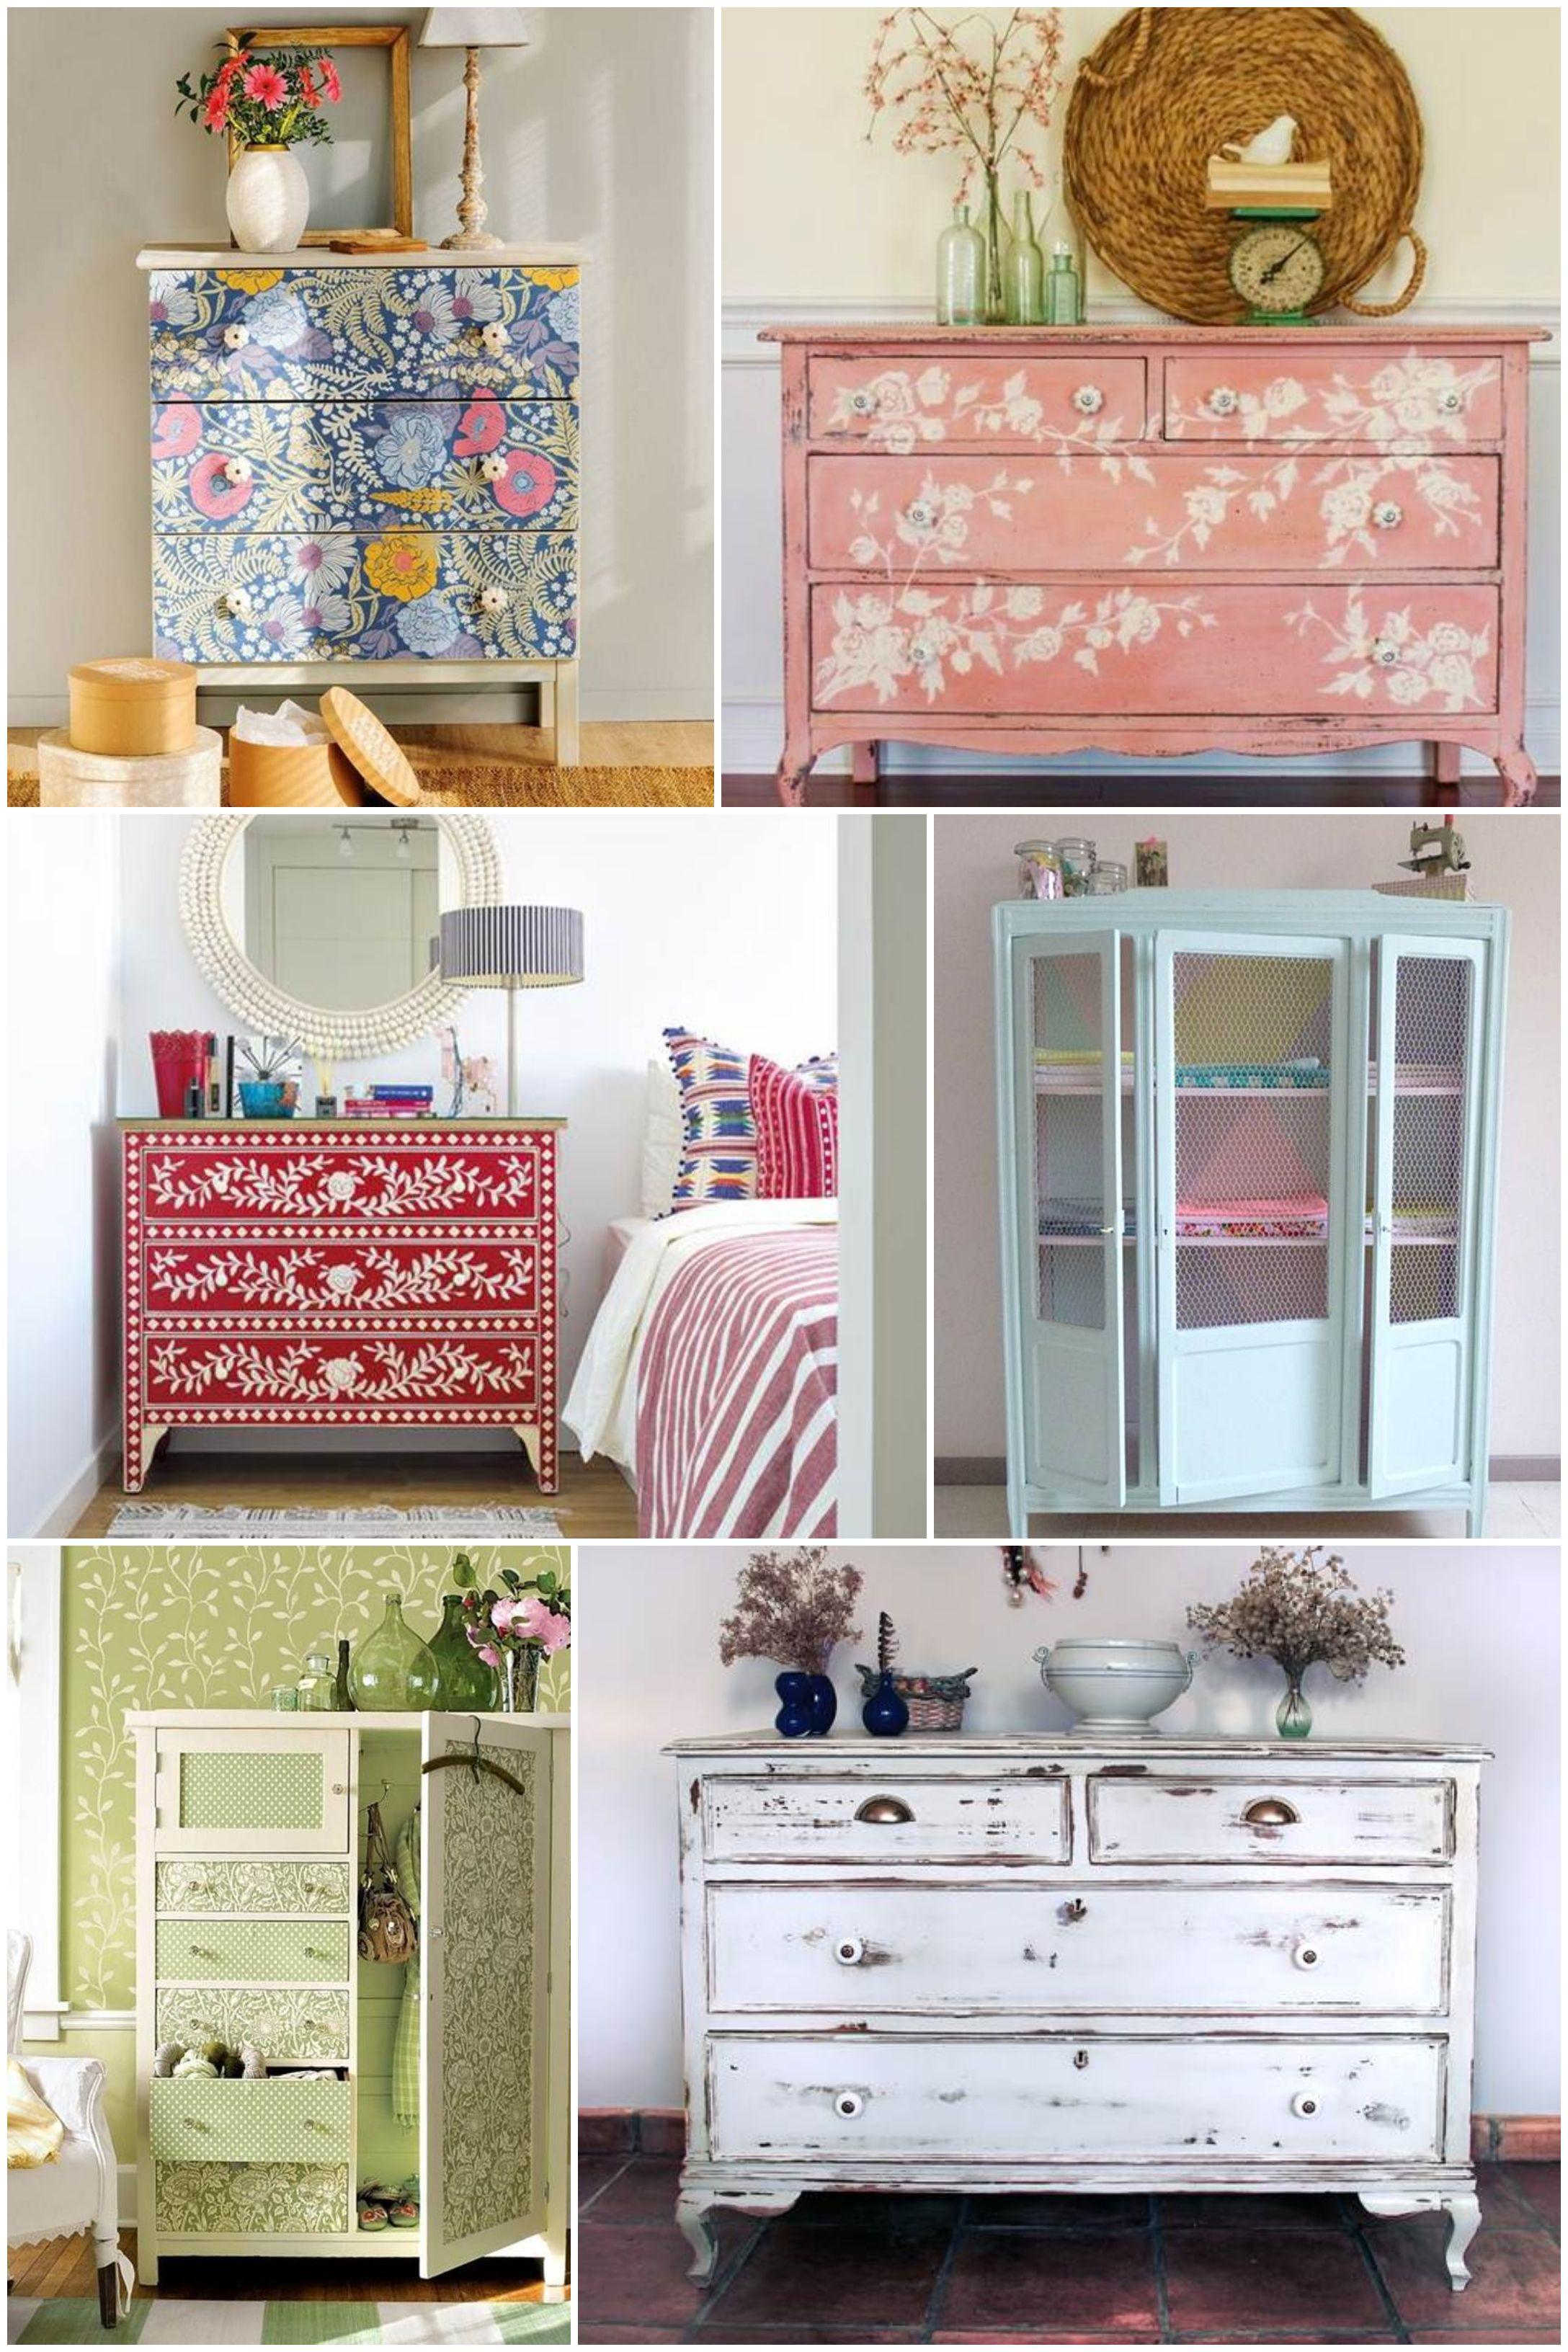 Restaurar Muebles Viejos Ideas Para Restaurar Muebles Antiguos Restaurar Muebles Antiguos Muebles Antiguos Como Restaurar Muebles